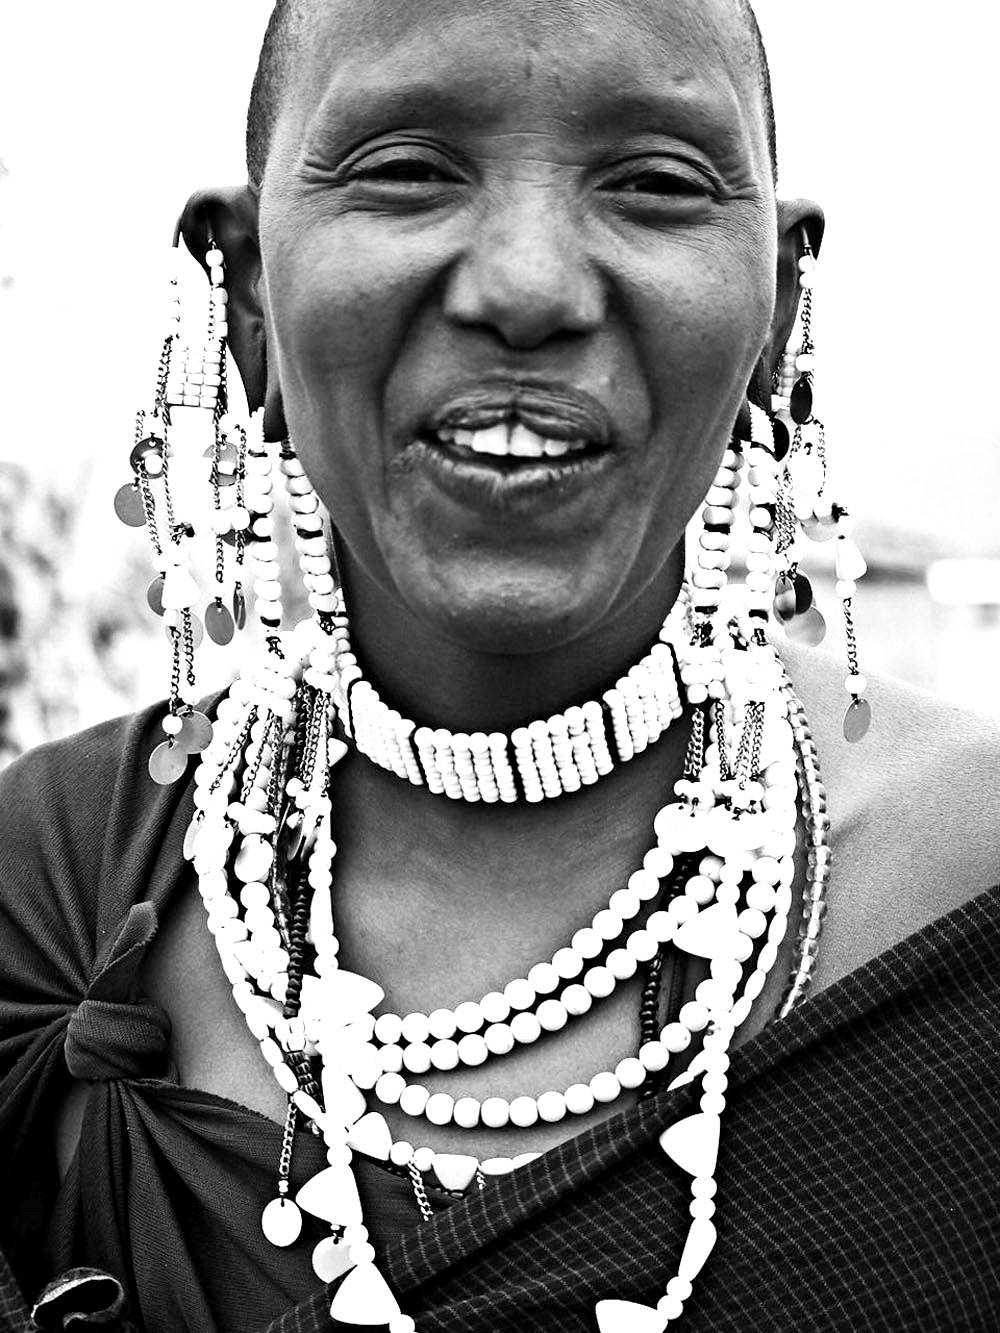 Maasai woman wearing traditional Maasai necklaces and earrings.